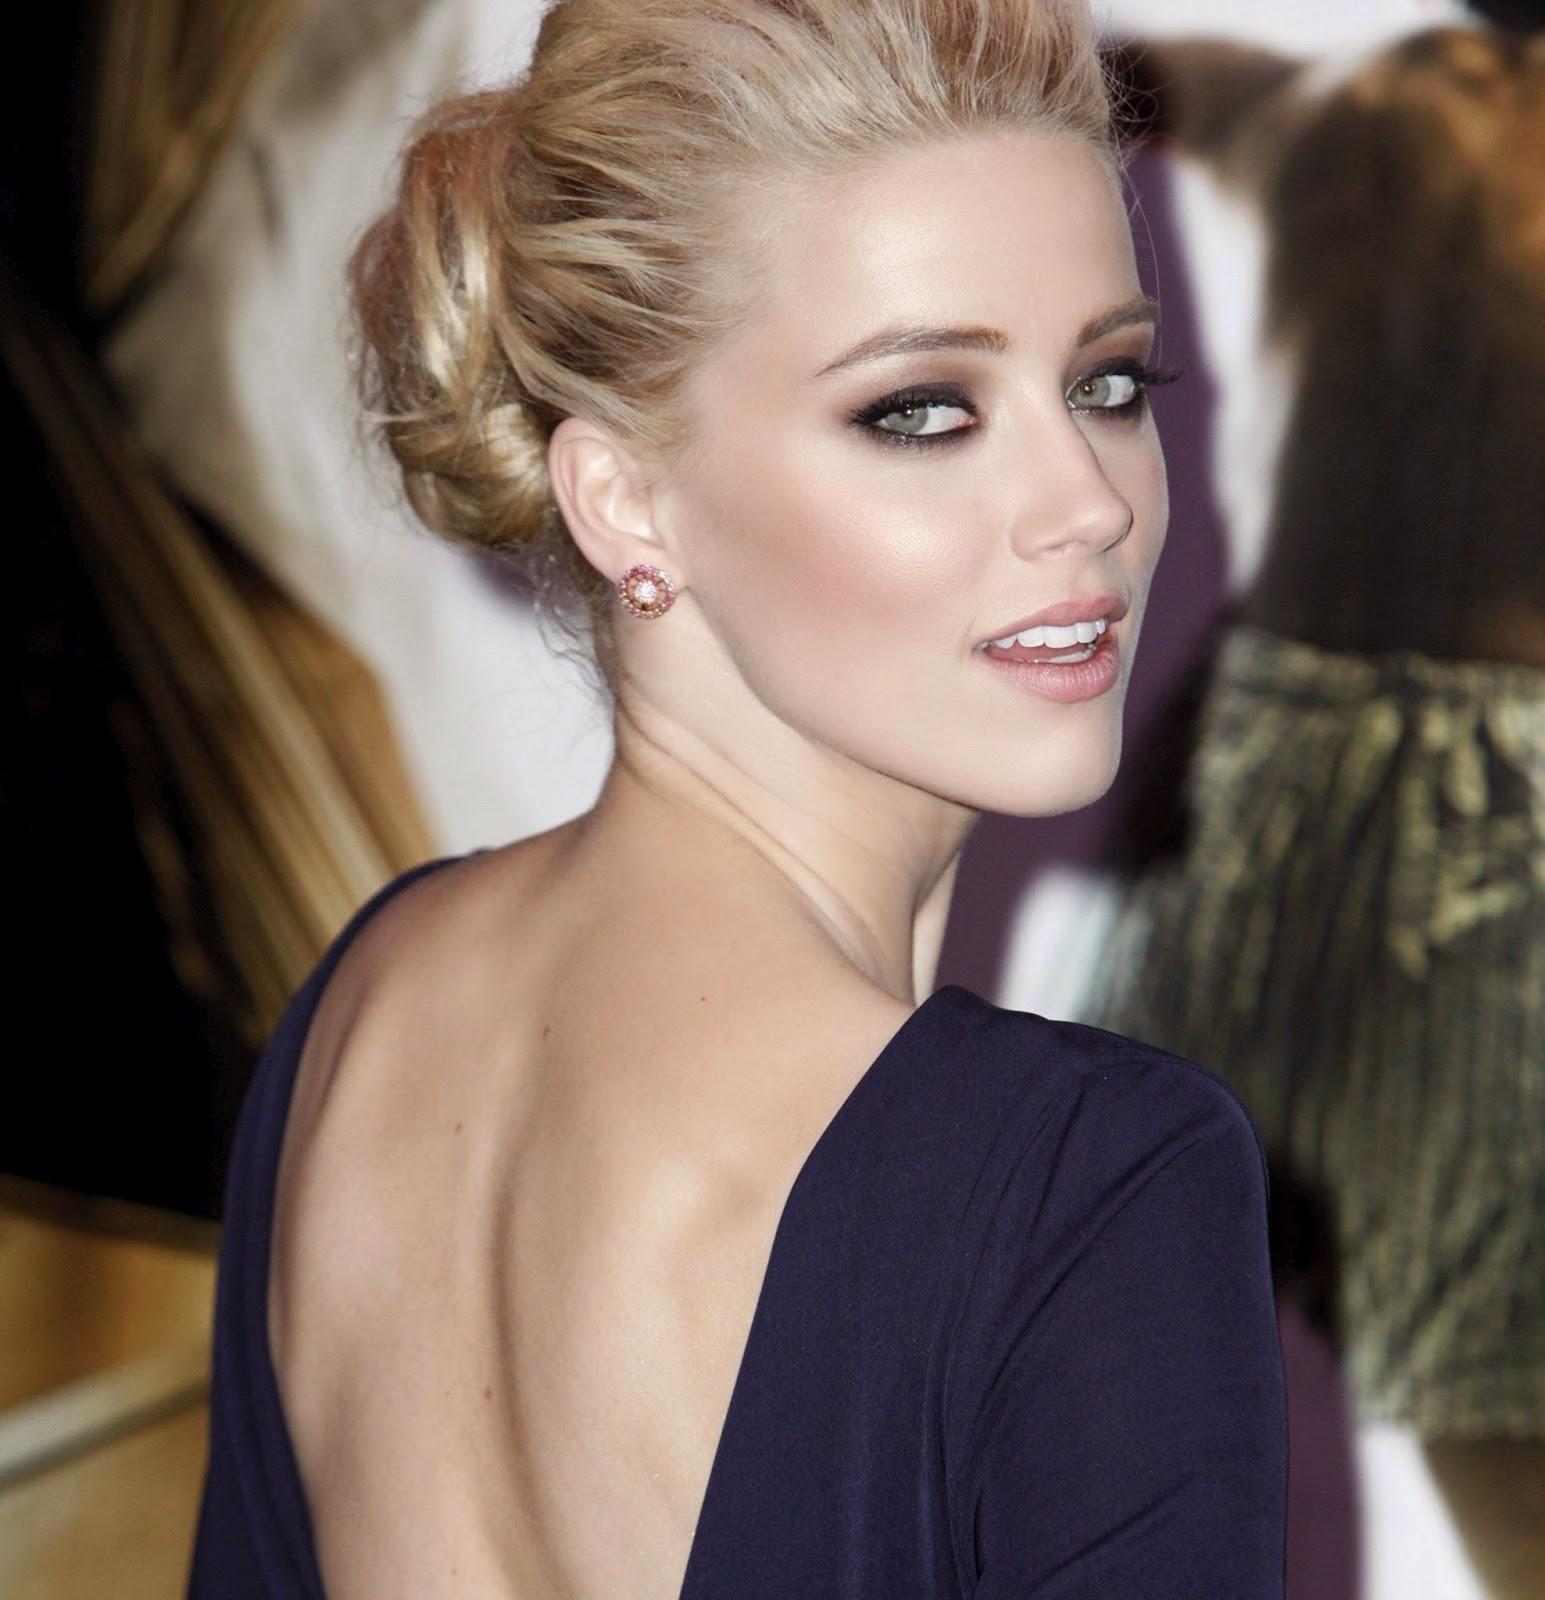 Hollywood Actress Wallpaper: Amber Heard HD Wallpapers